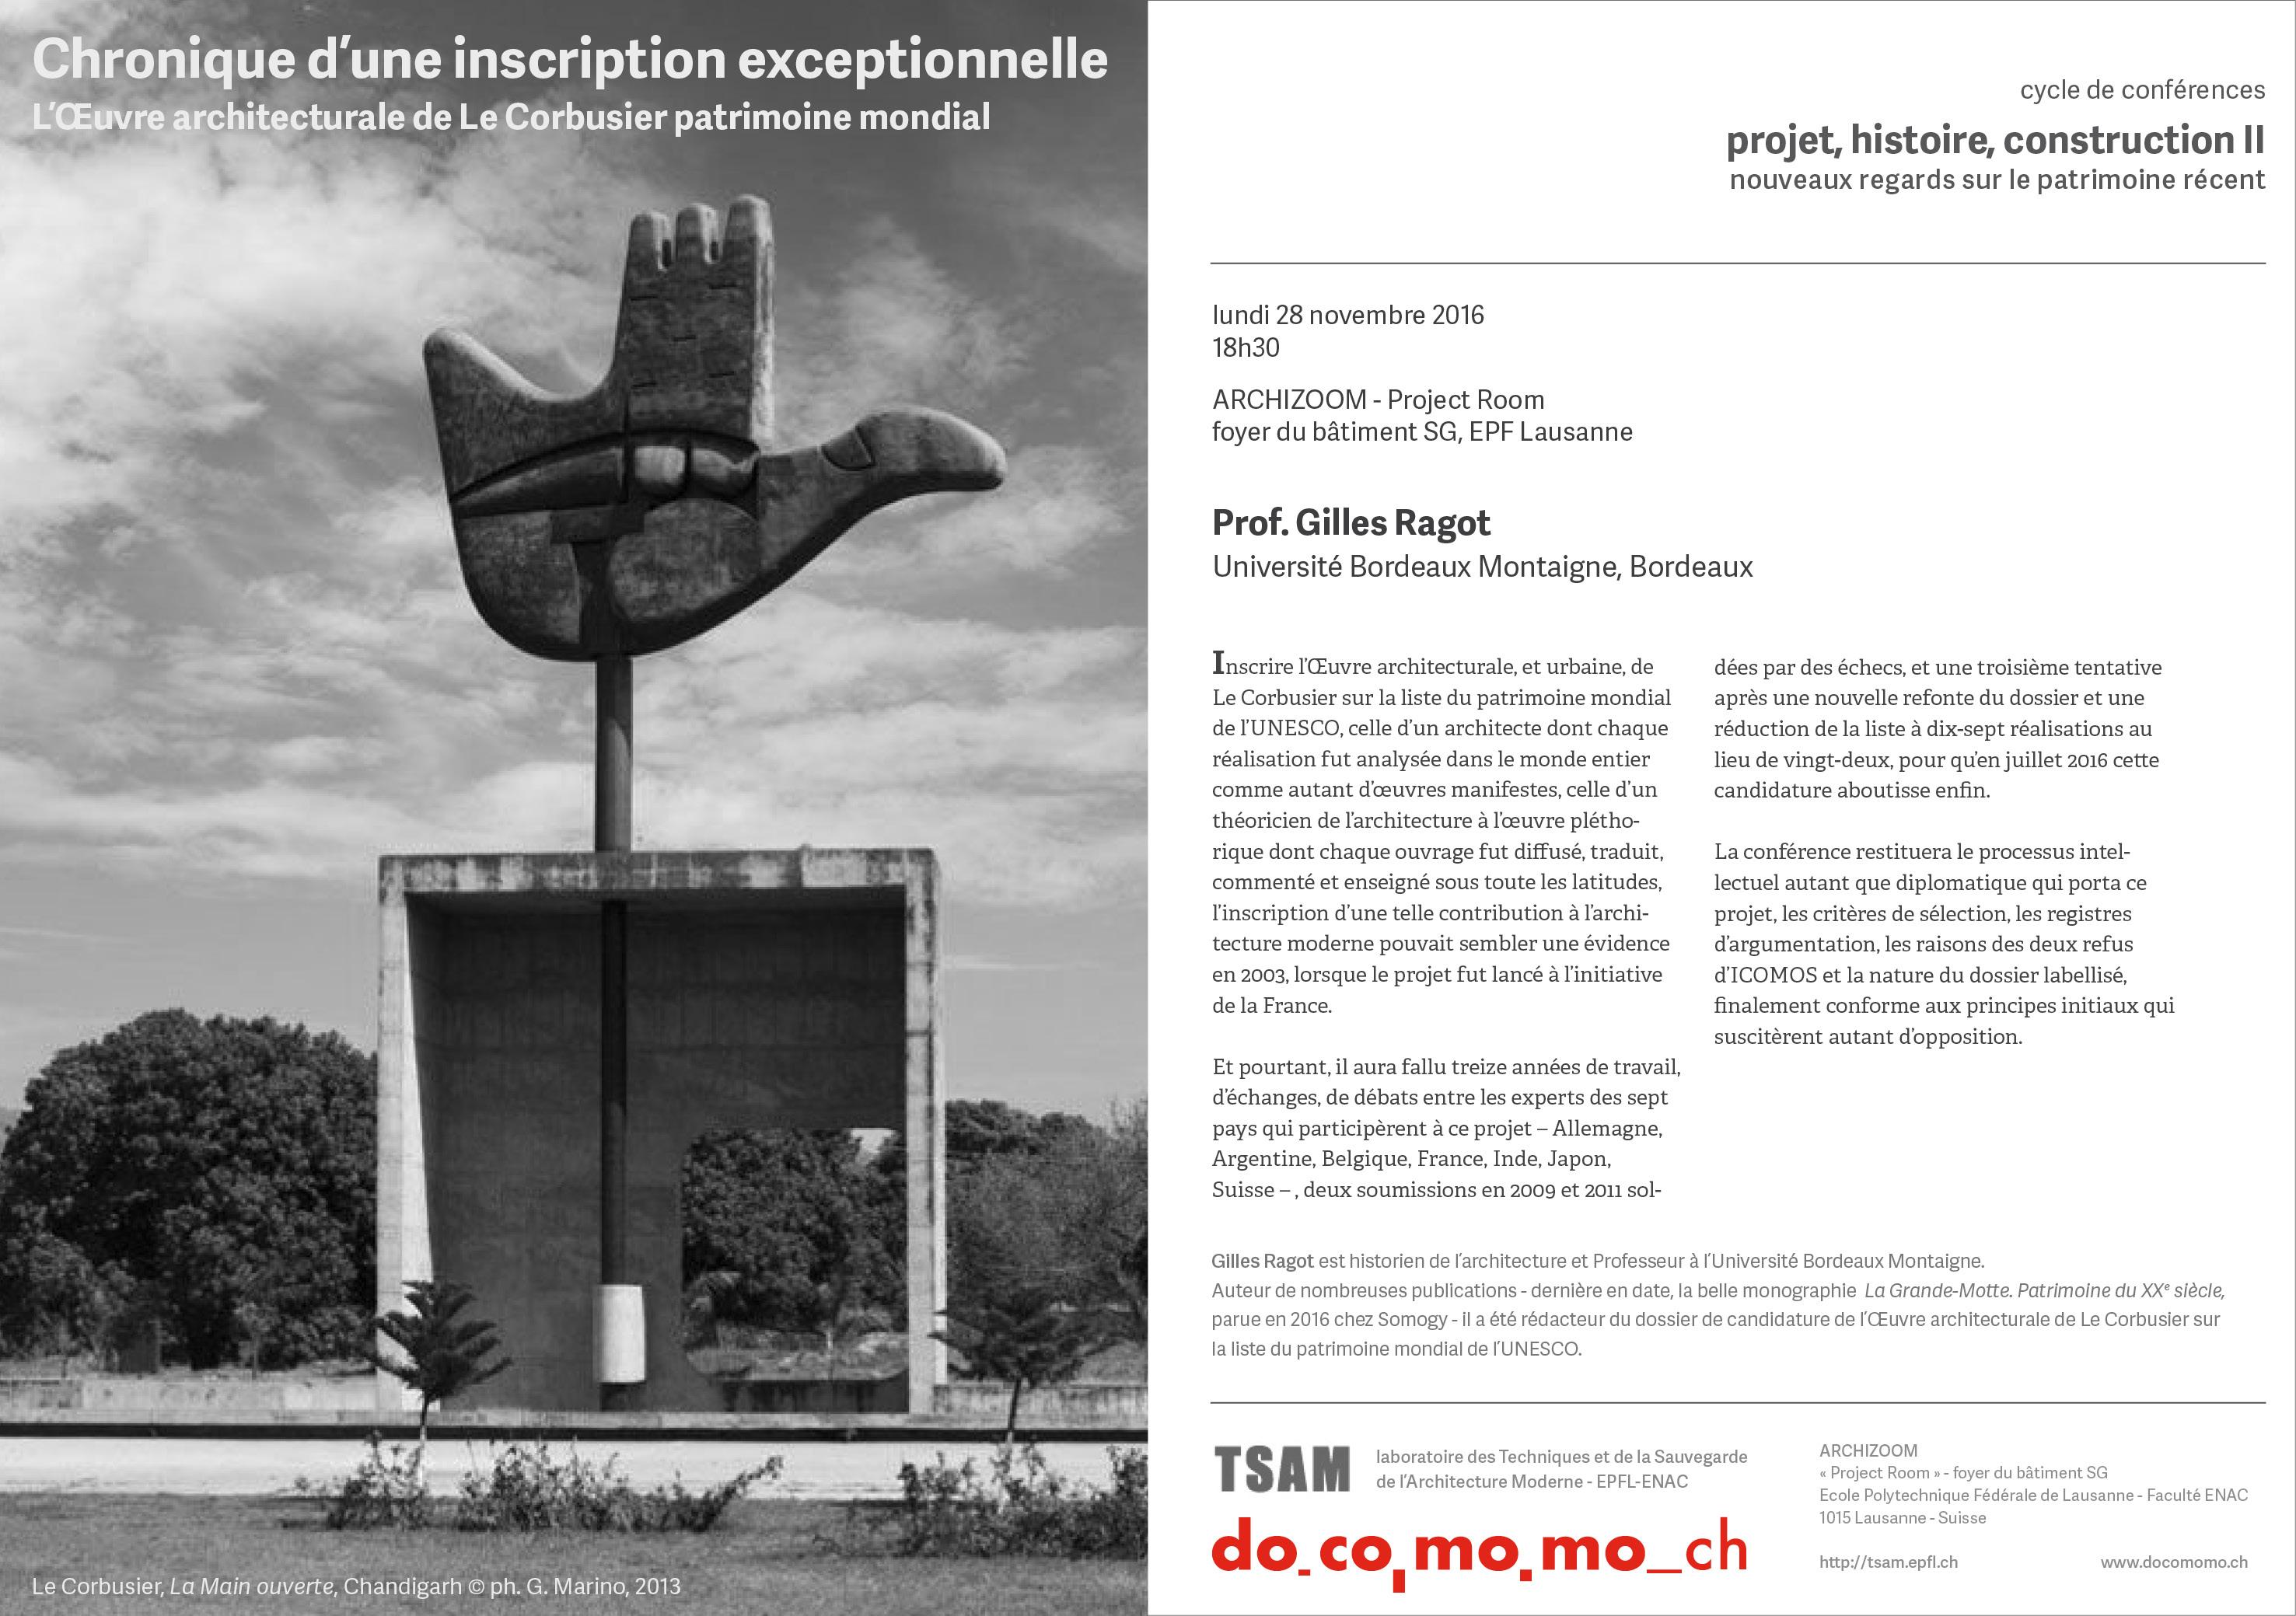 Gilles Ragot Le Corbusier UNESCO patrimoine mondial Chandigarh